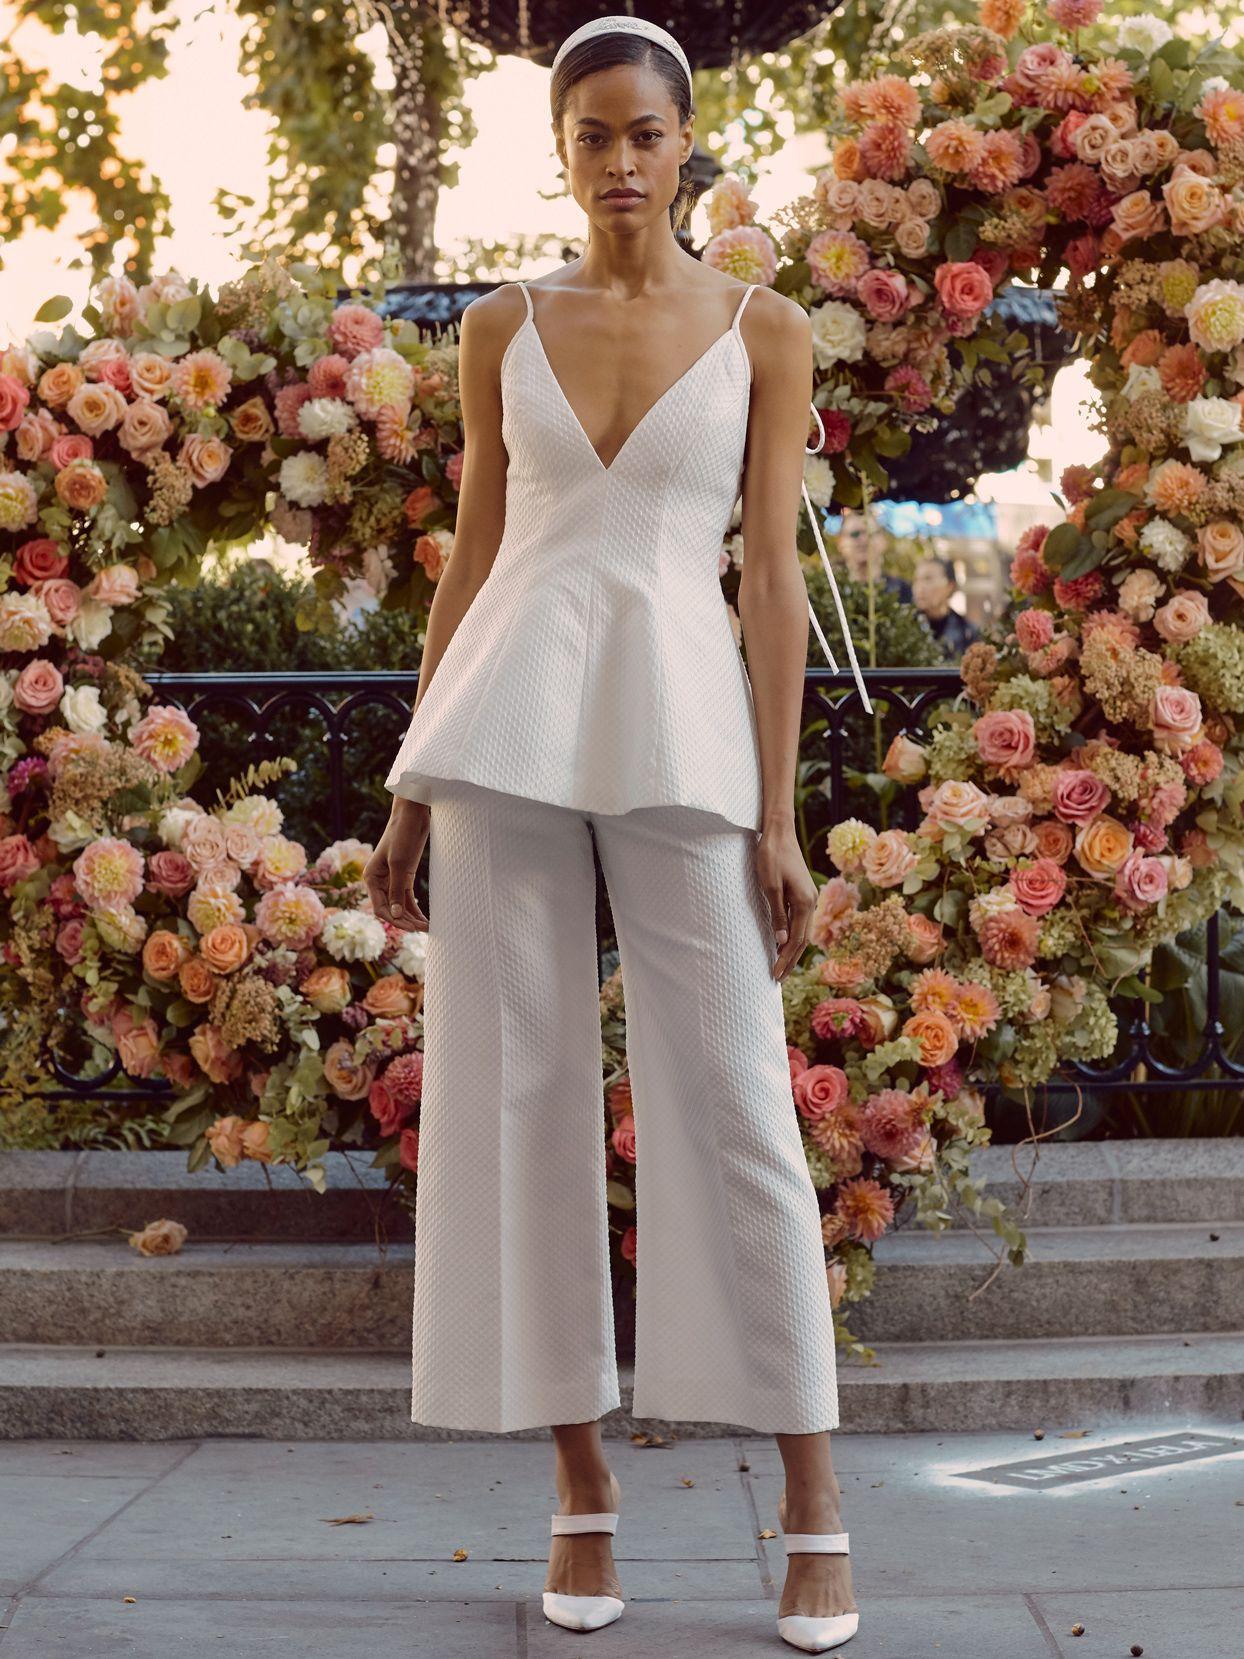 Lela Rose Fall 2020 Wedding Dress Collection